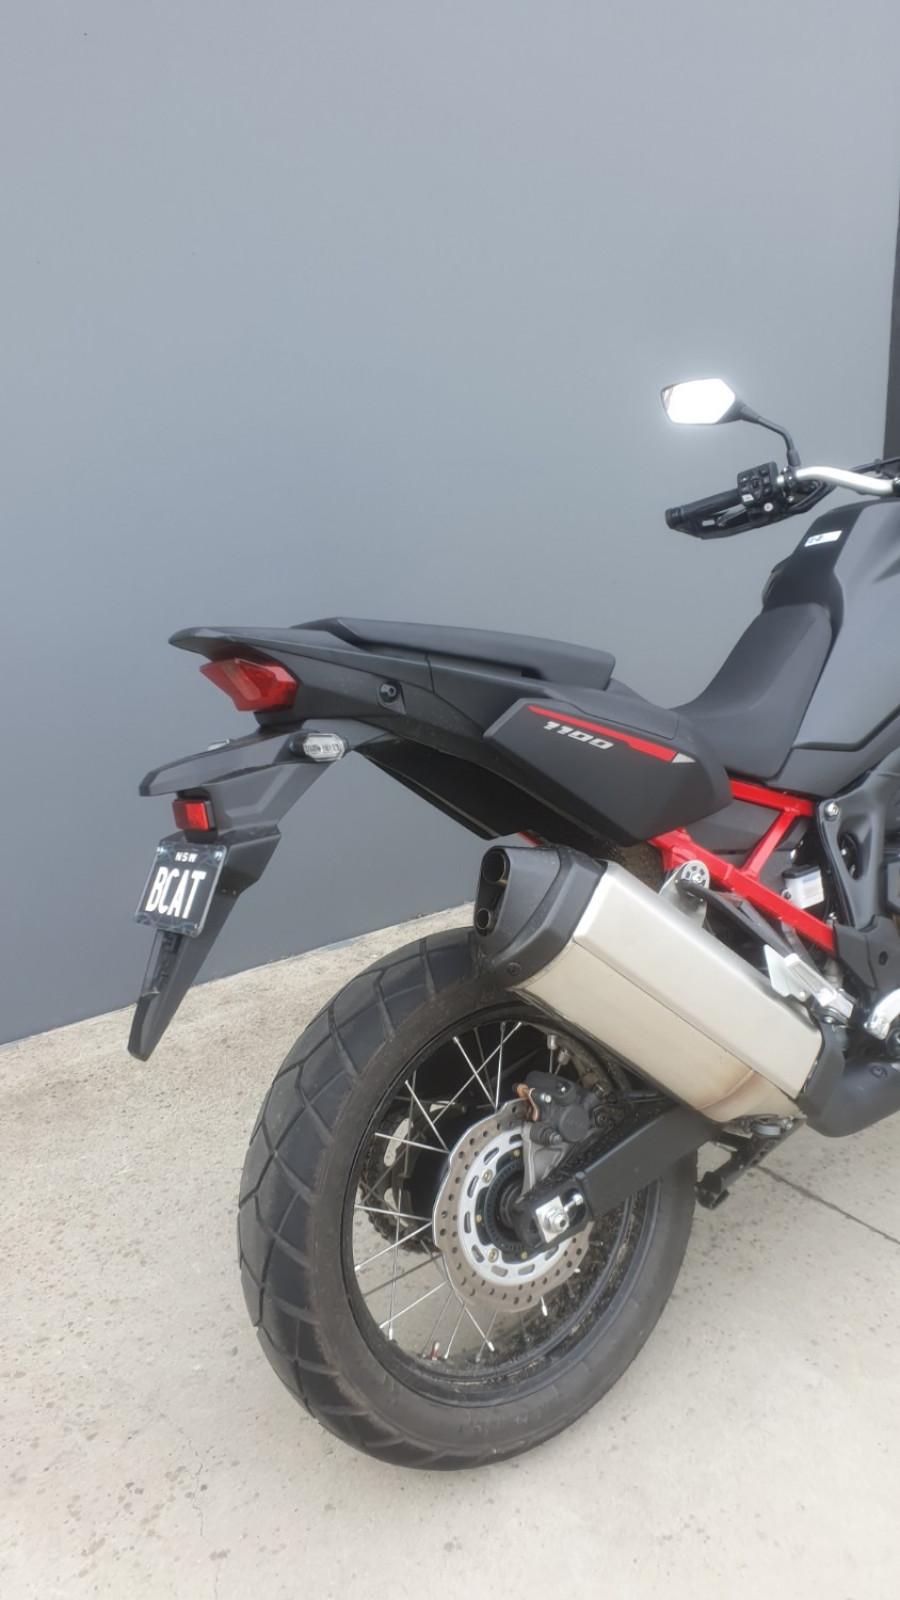 2020 Honda CRF1100AL2 TEMP 2020 Africa Twin Motorcycle Image 16